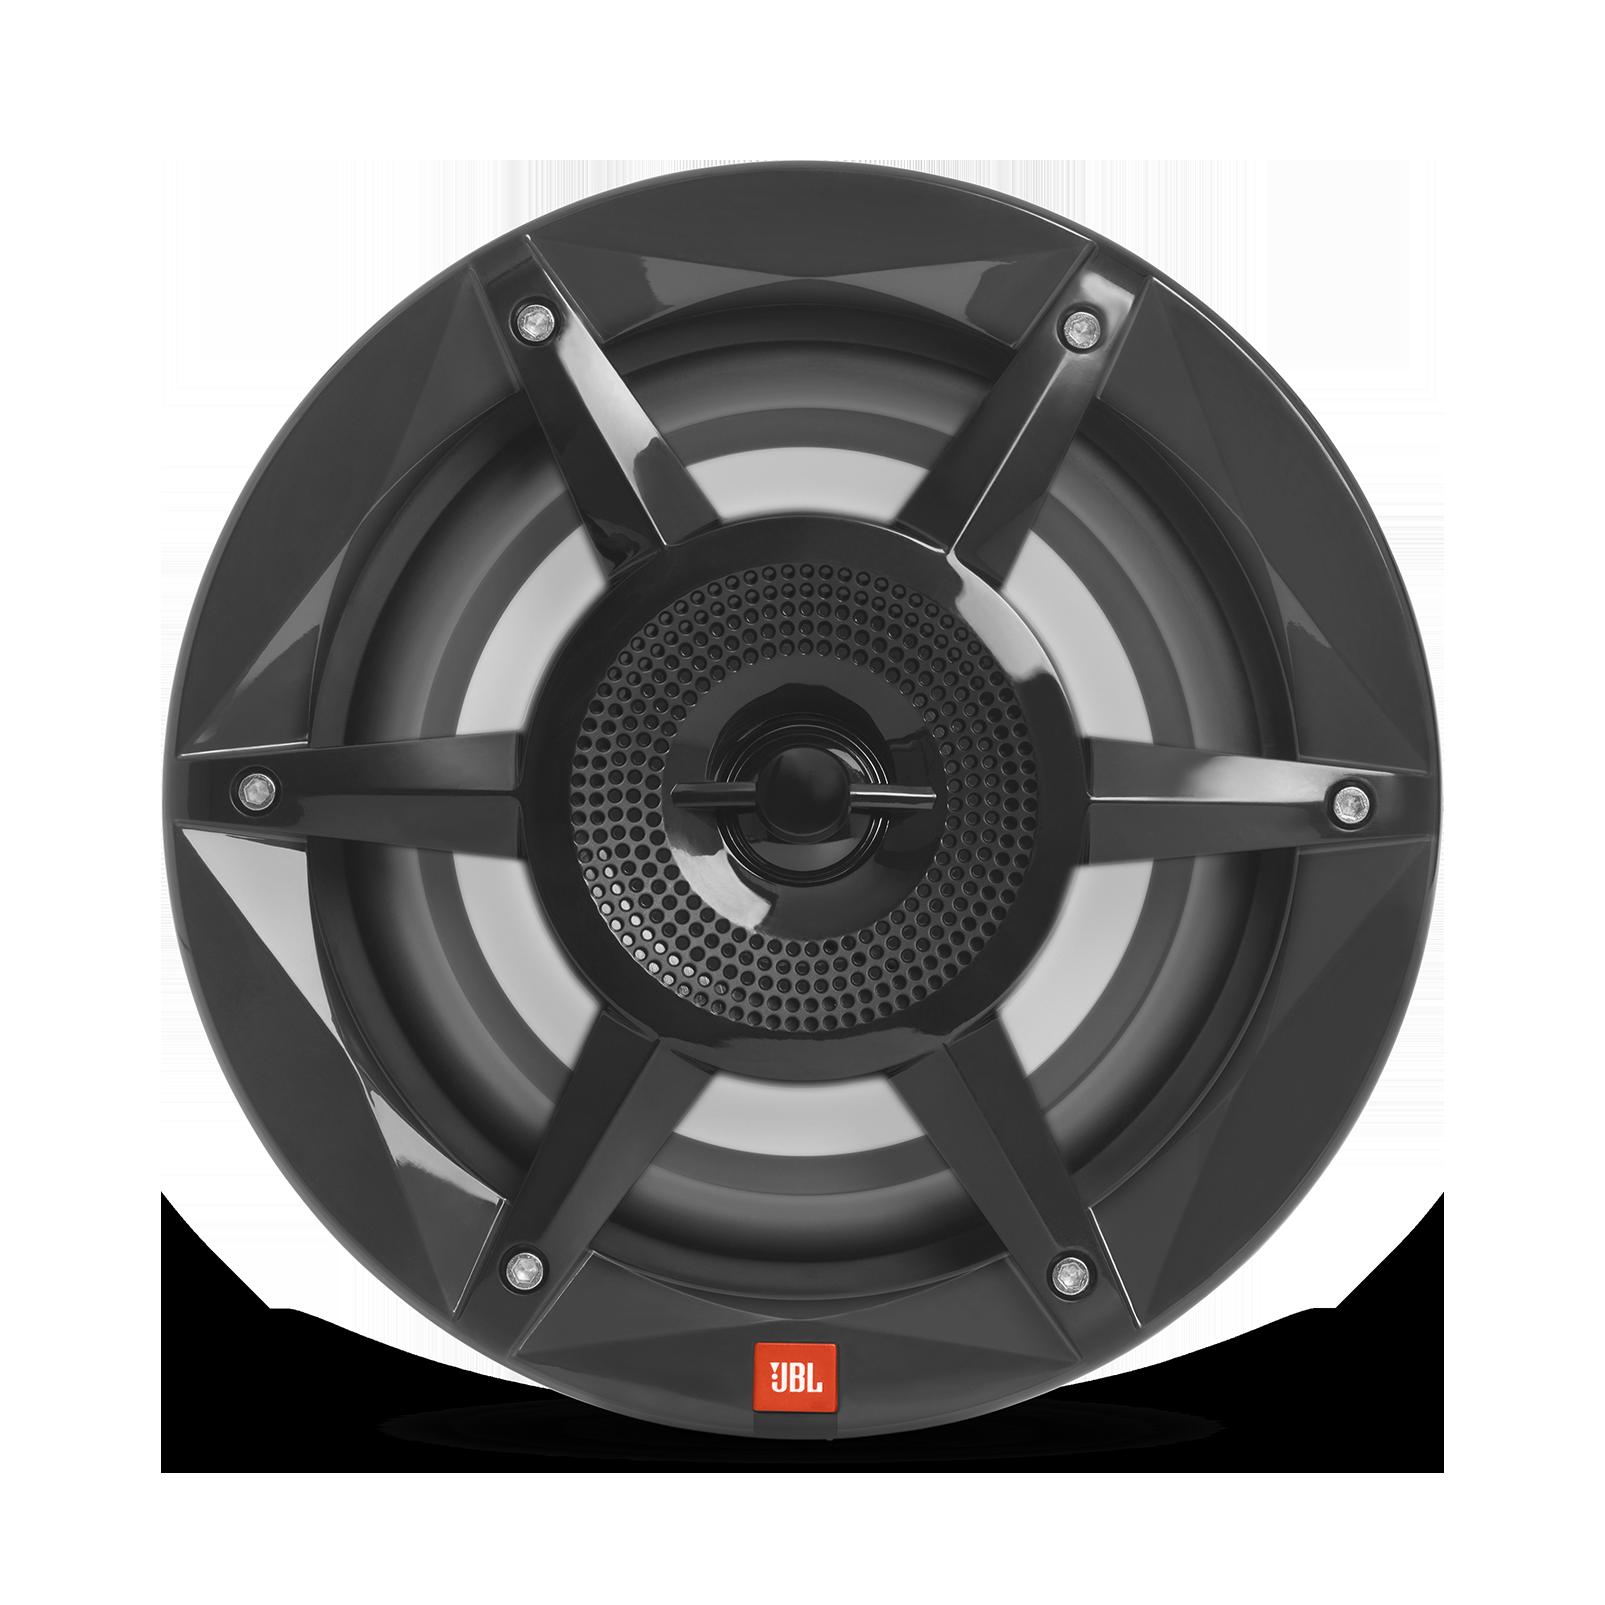 JBL Stadium Marine M6520 - Black - Take JBL concert level sound to the high seas. - Detailshot 5